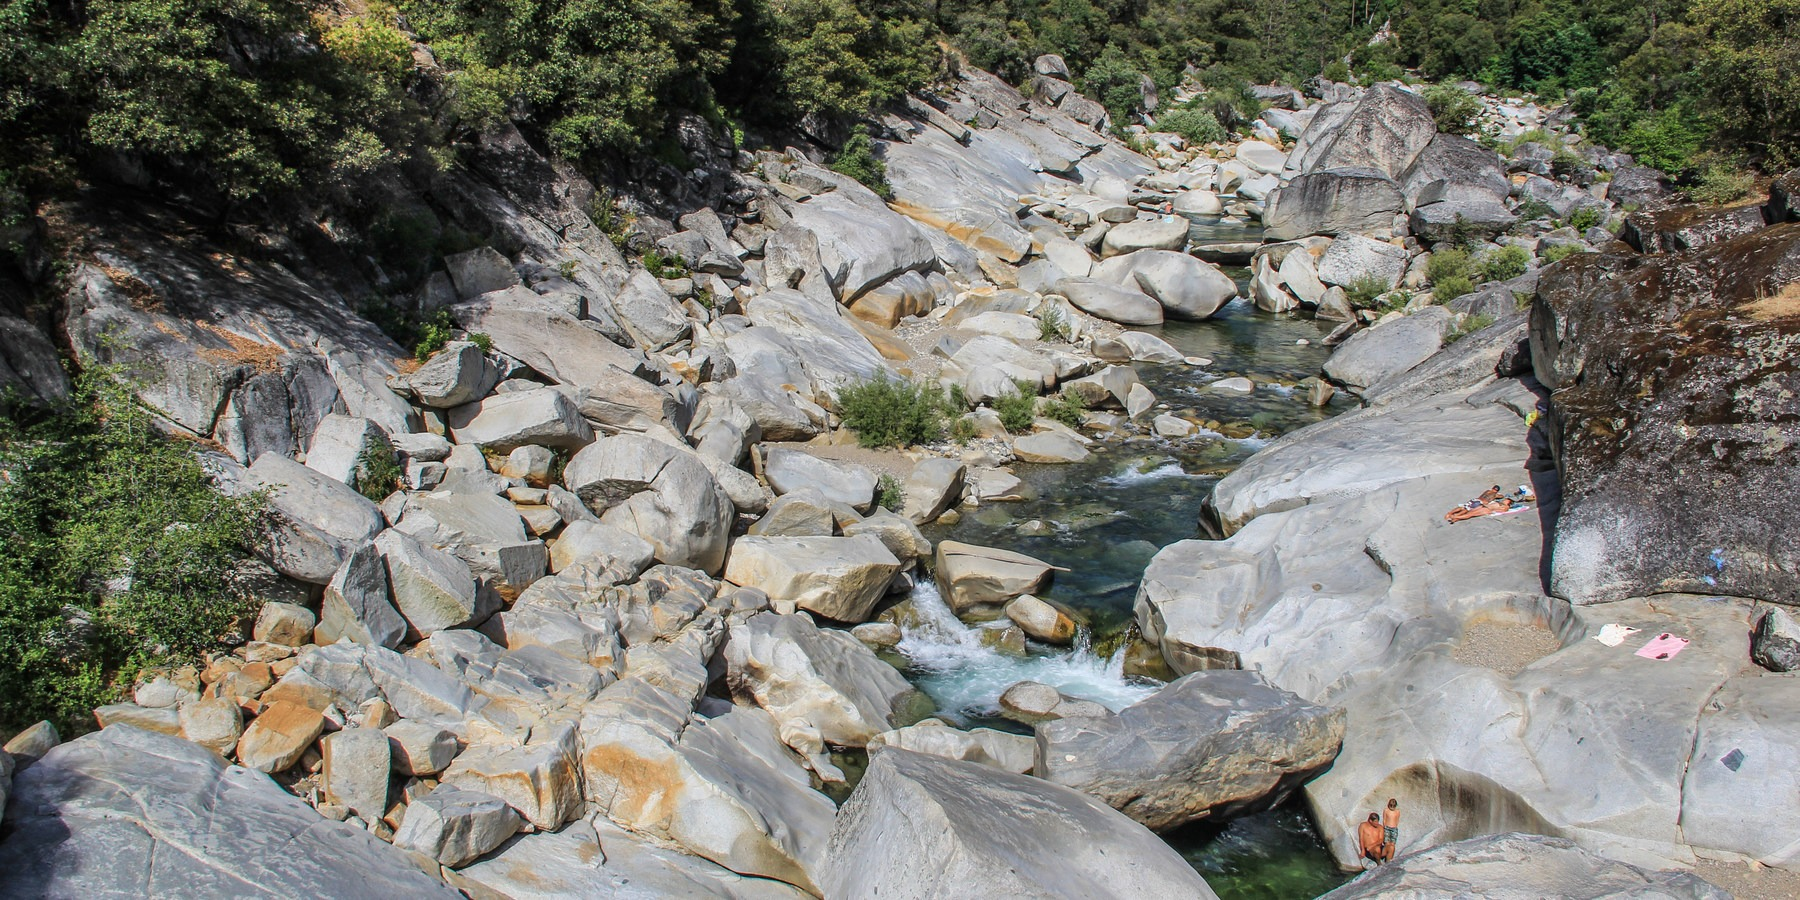 South yuba river state park california for Landscaping rocks yuba city ca